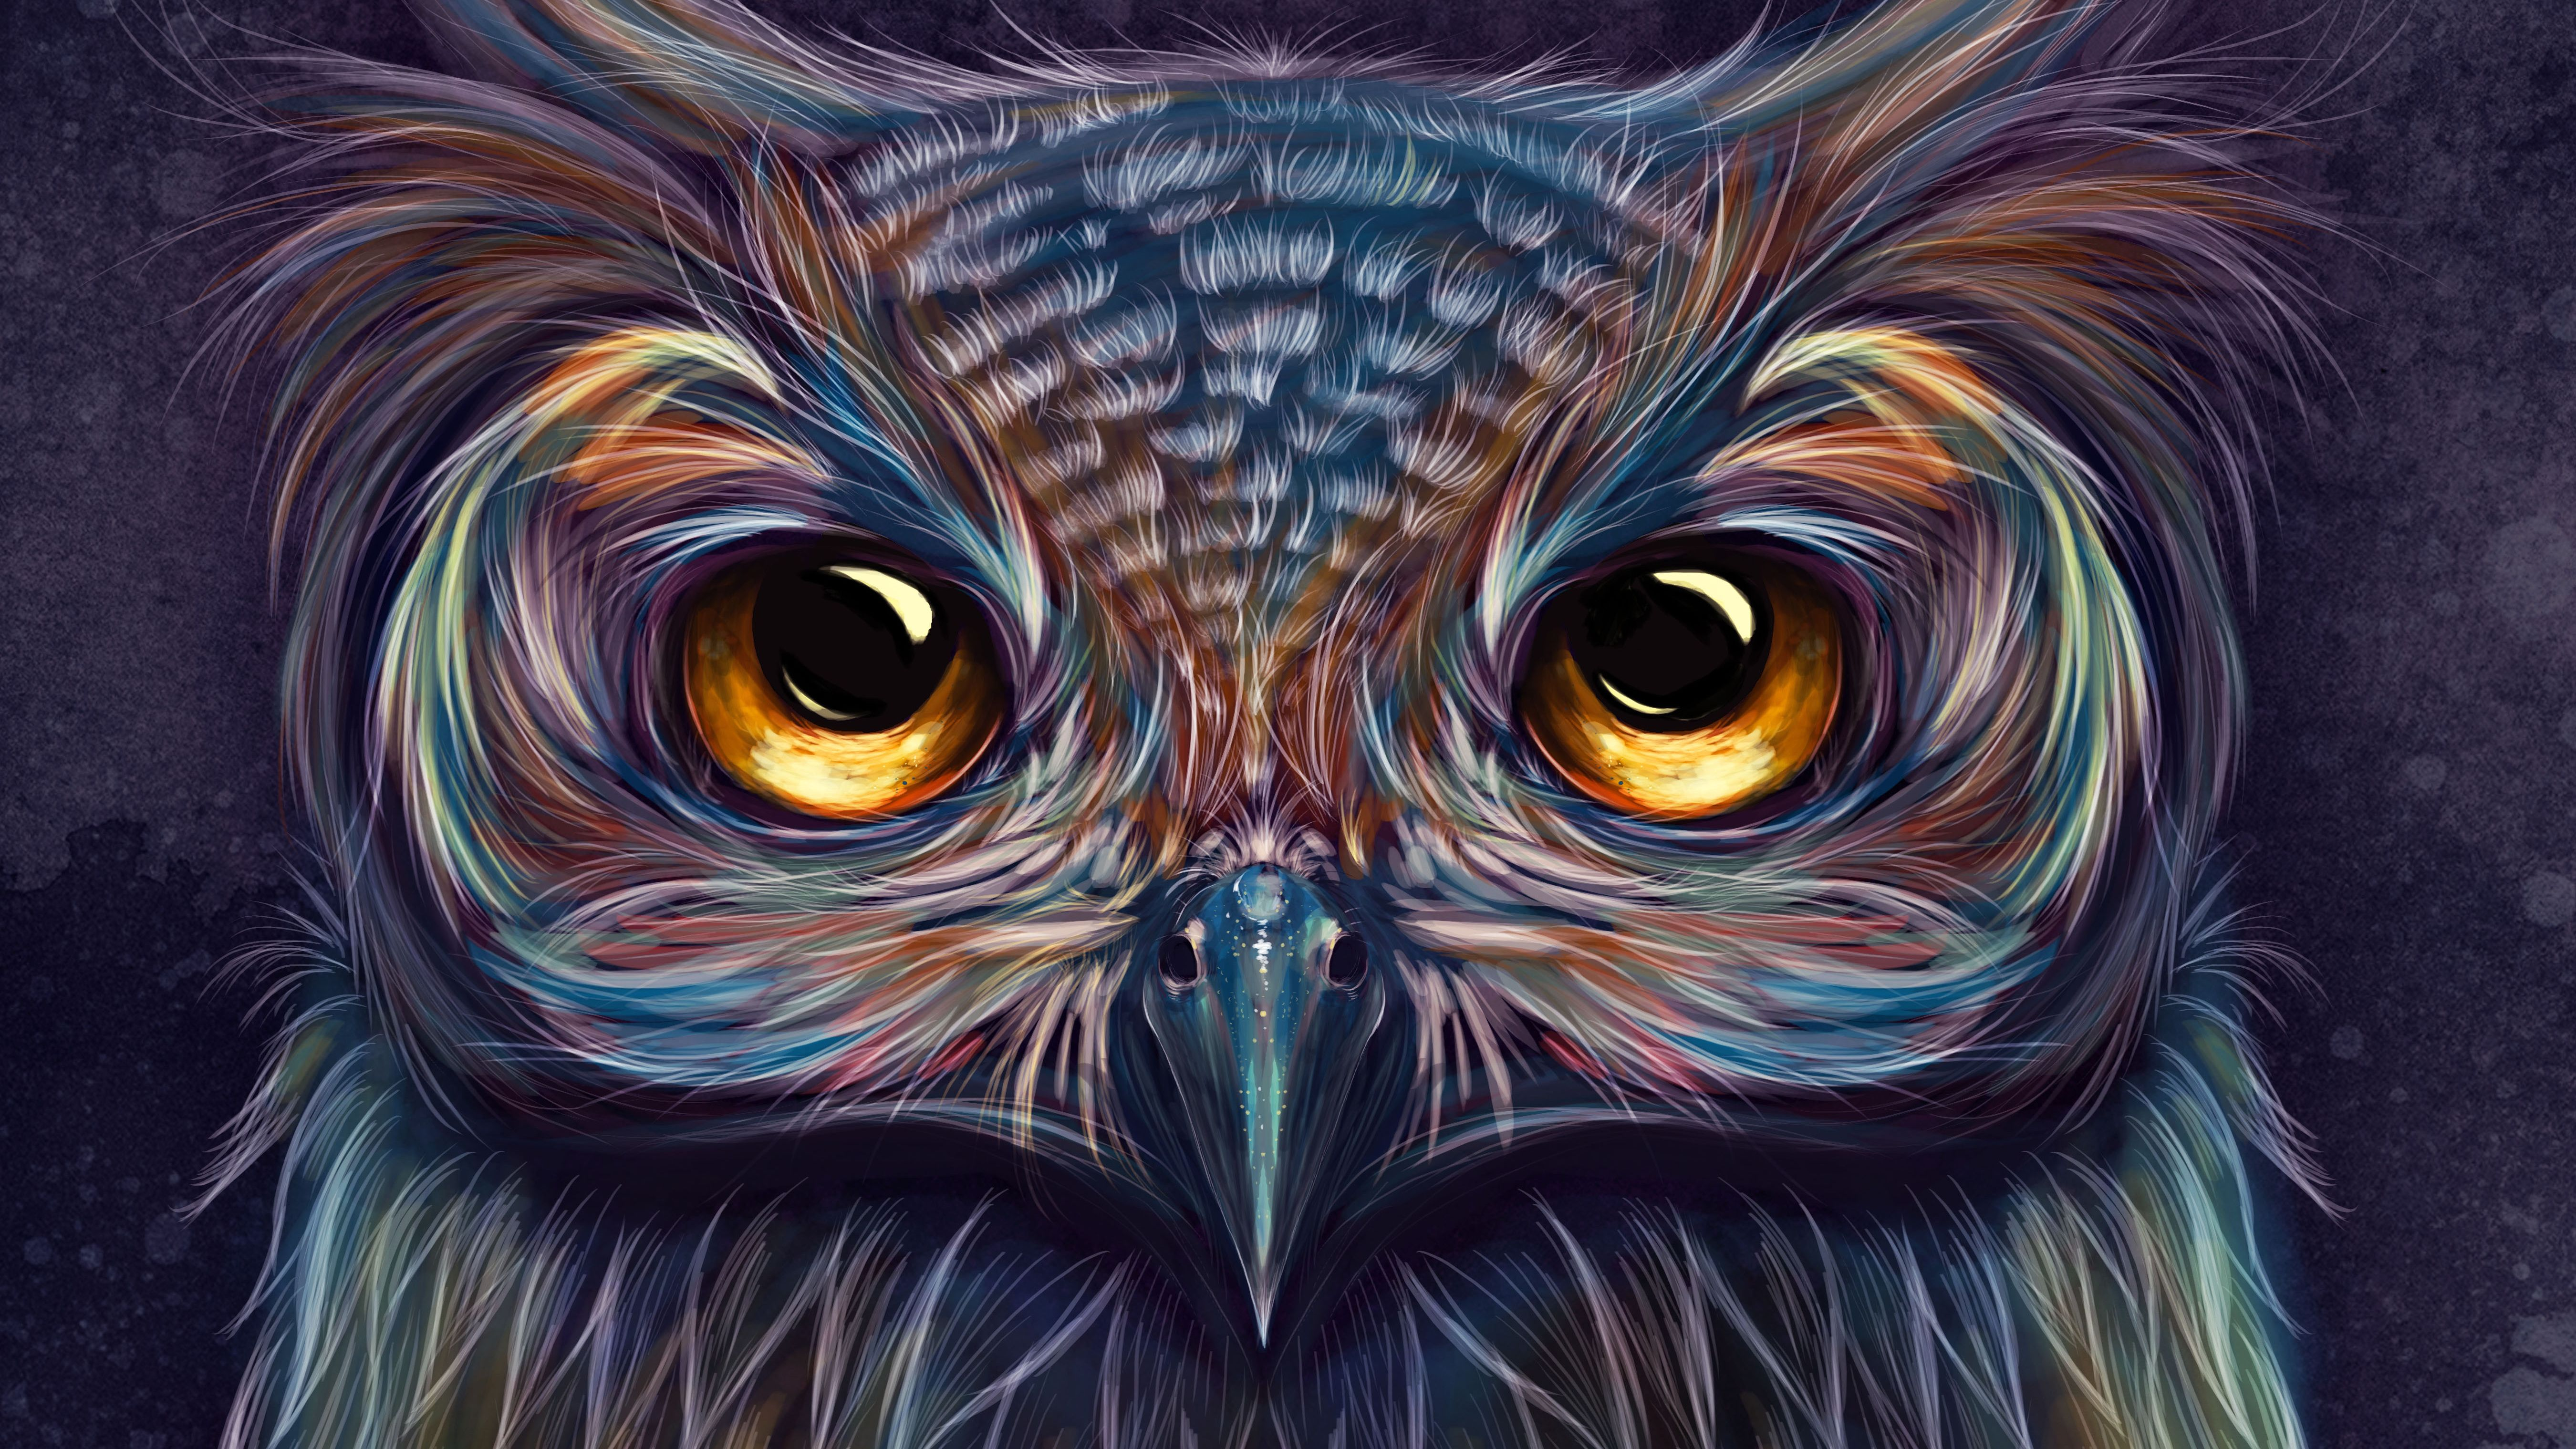 Art Owl Wallpapers Top Free Art Owl Backgrounds Wallpaperaccess